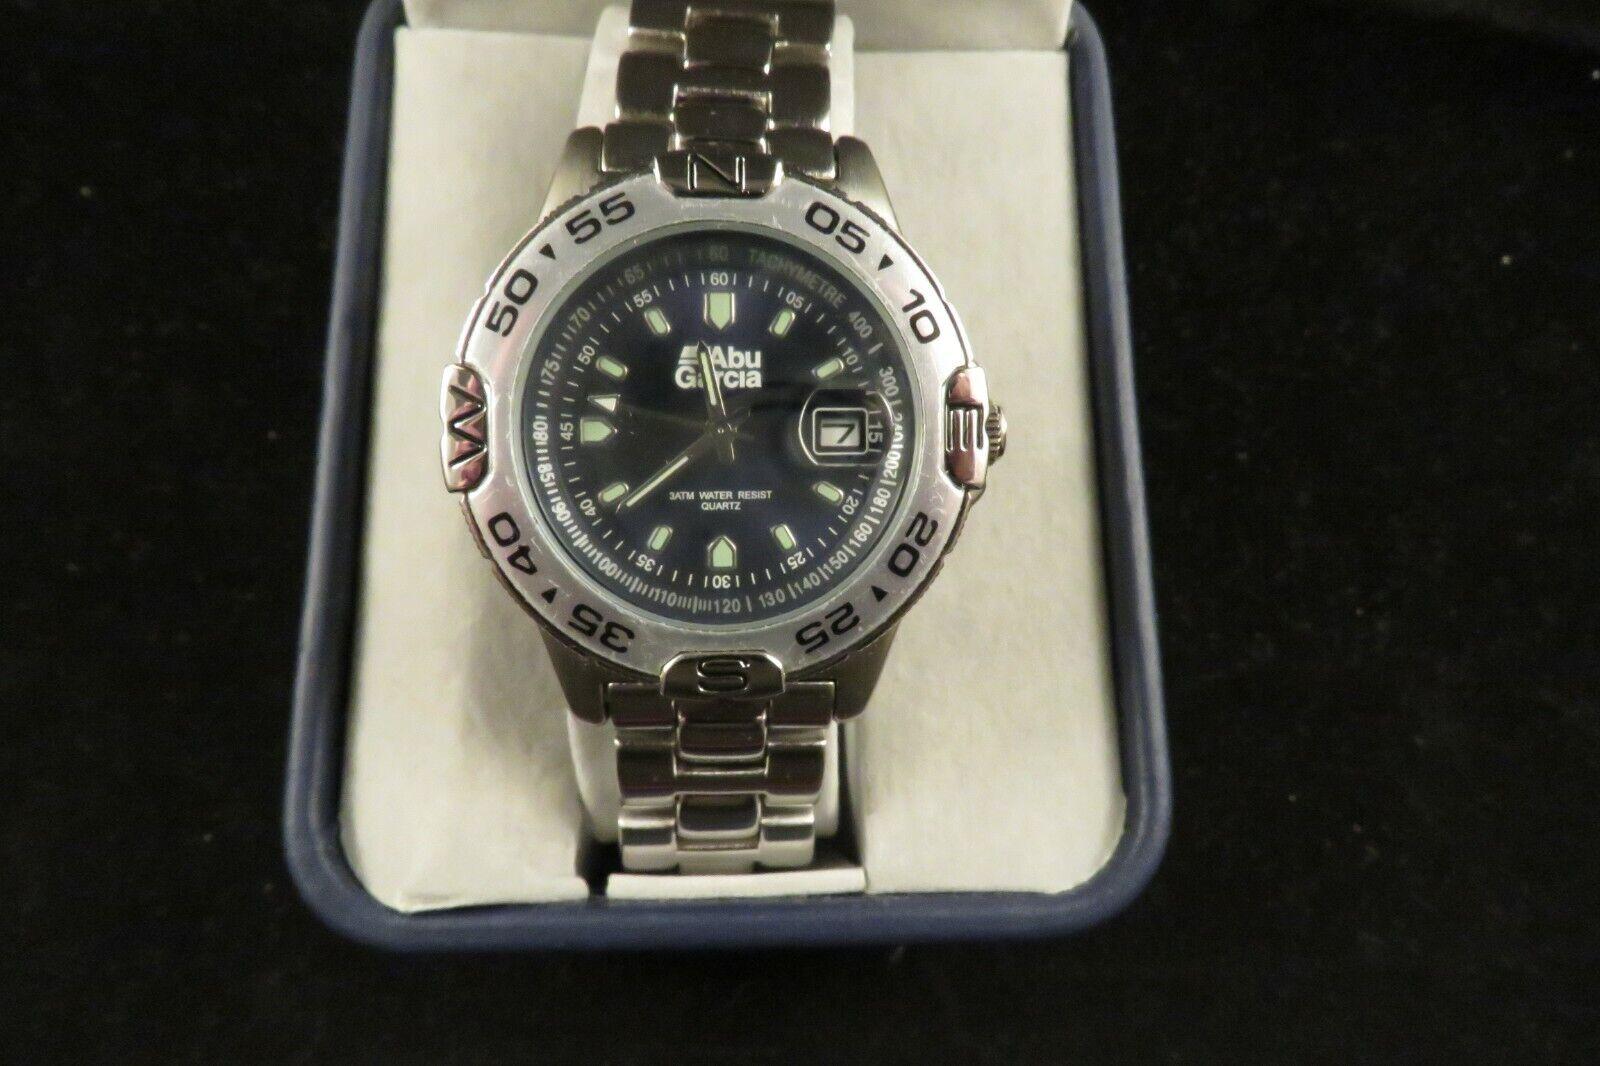 Abu Garcia Promotional Moruum Ambassadeur Baitcasting Fishing Reel Wrist Watch